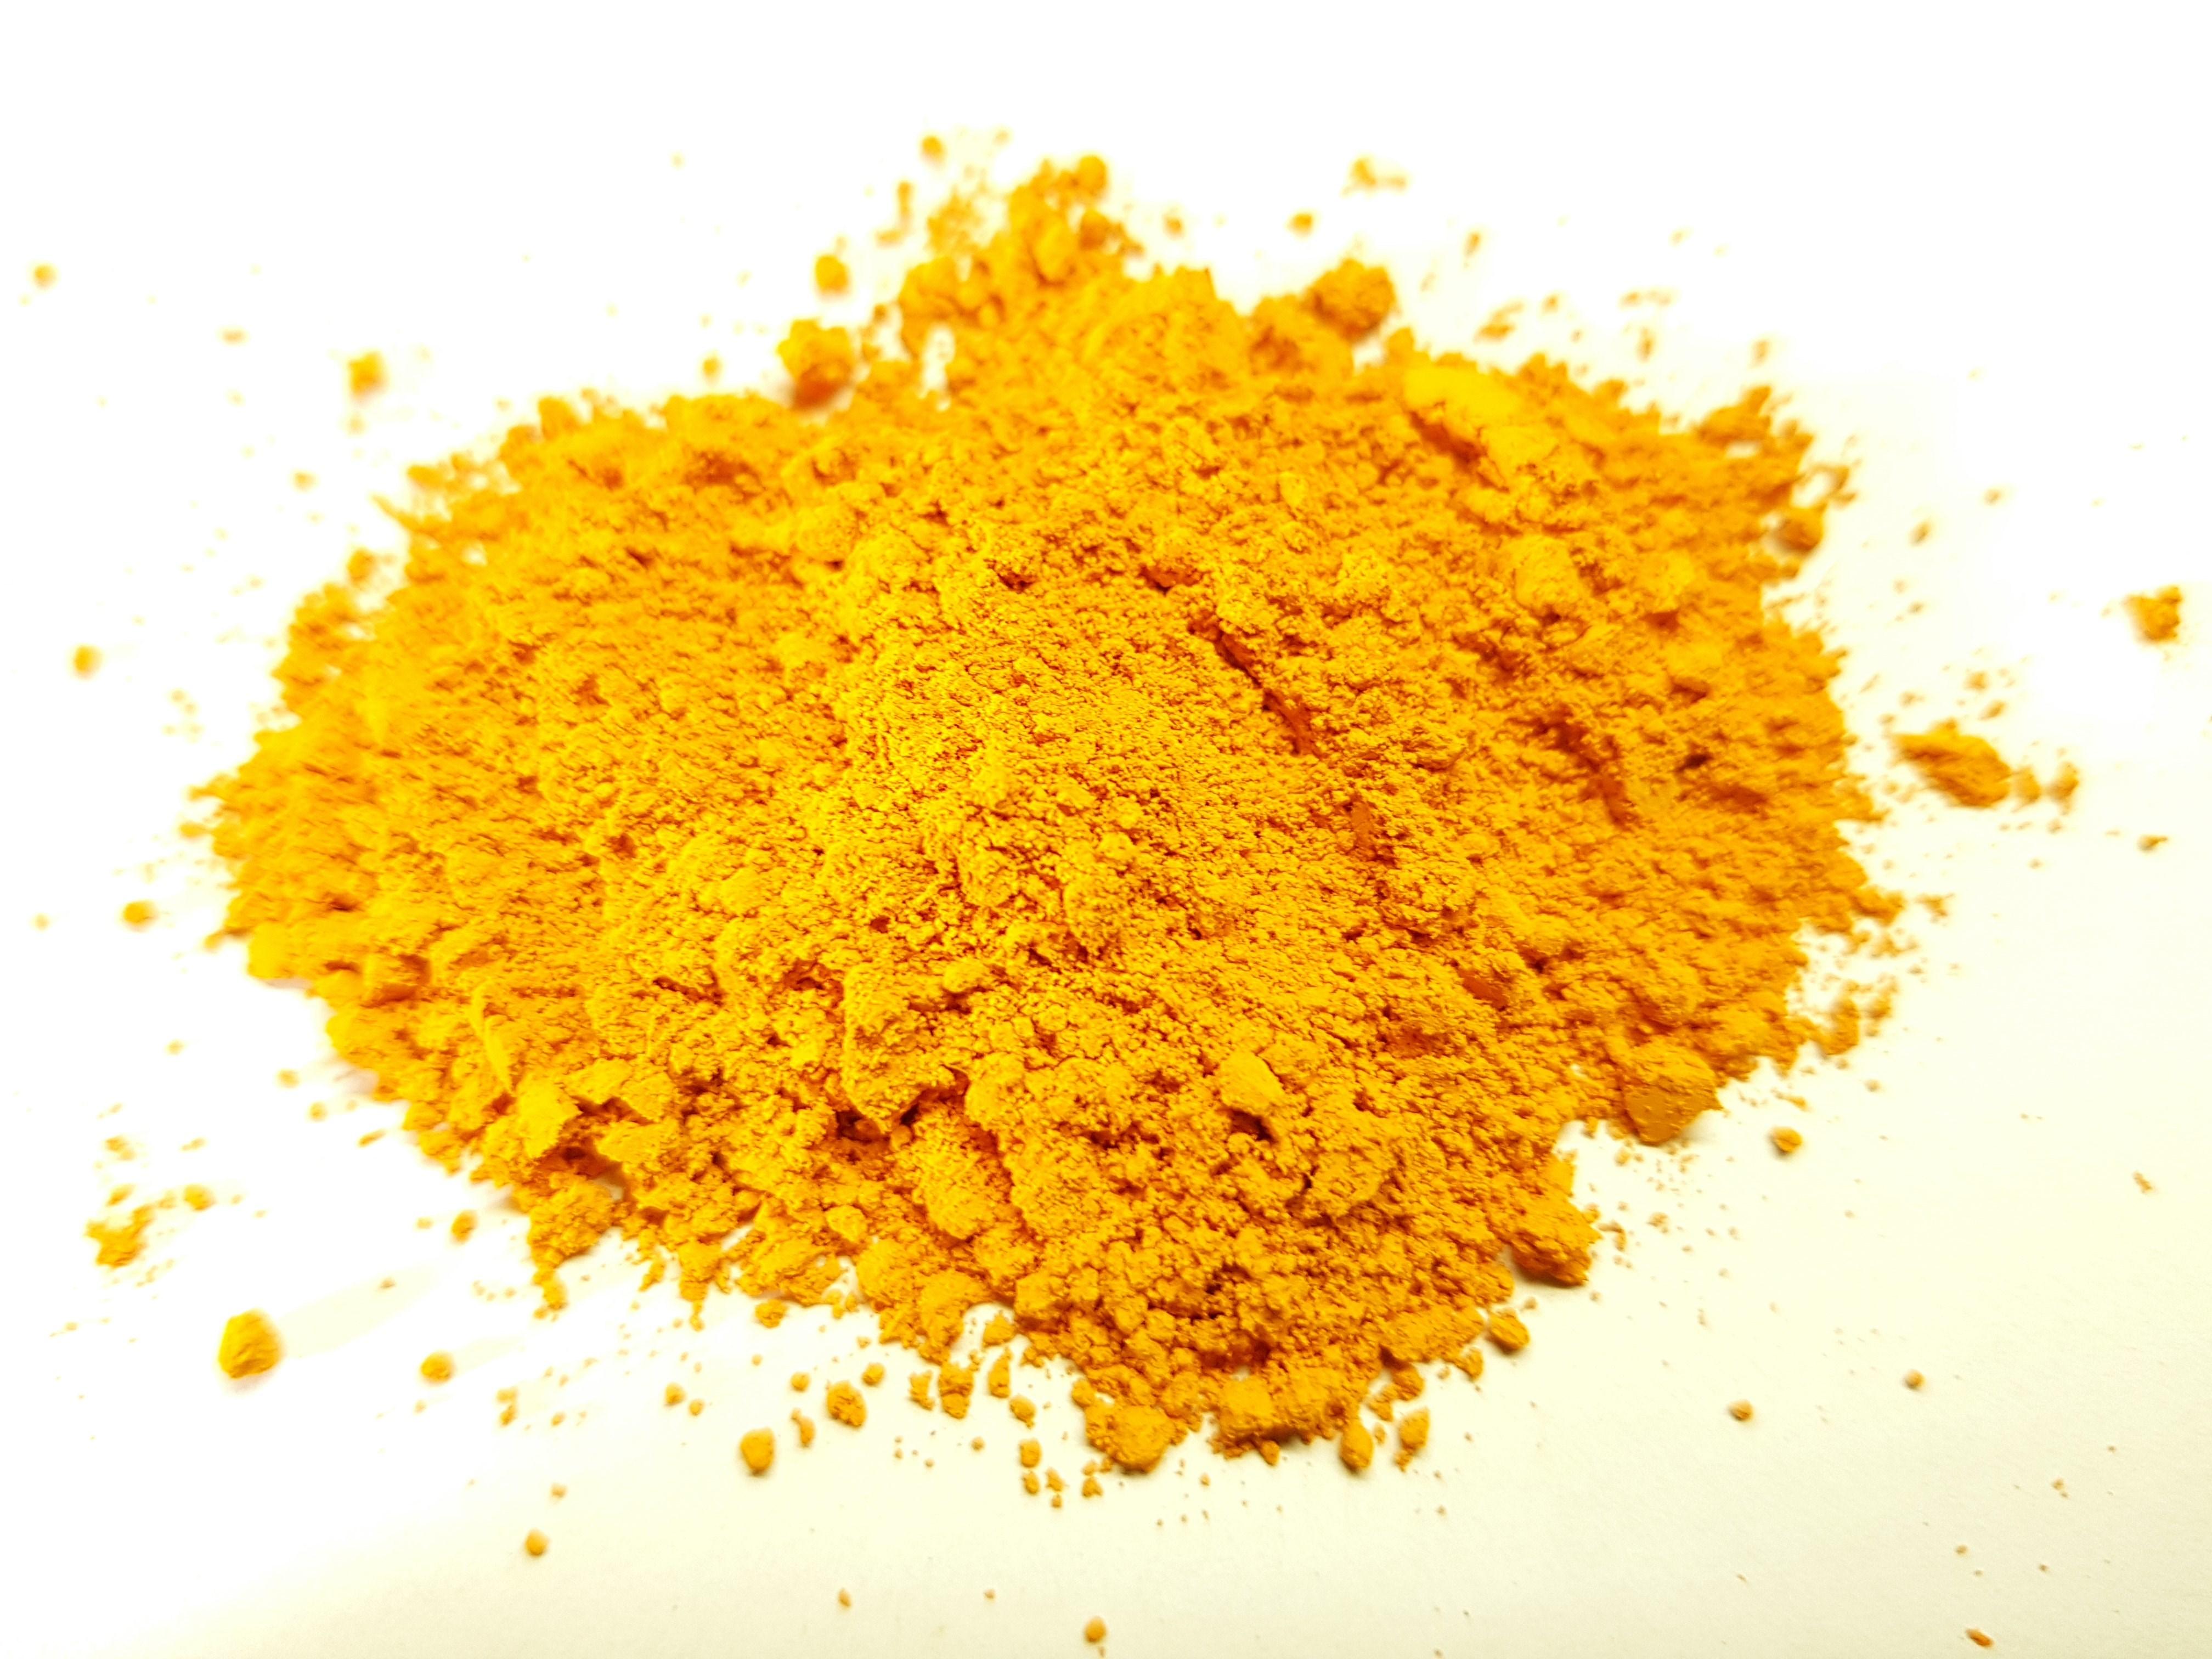 Acid Metanil Yellow 2G